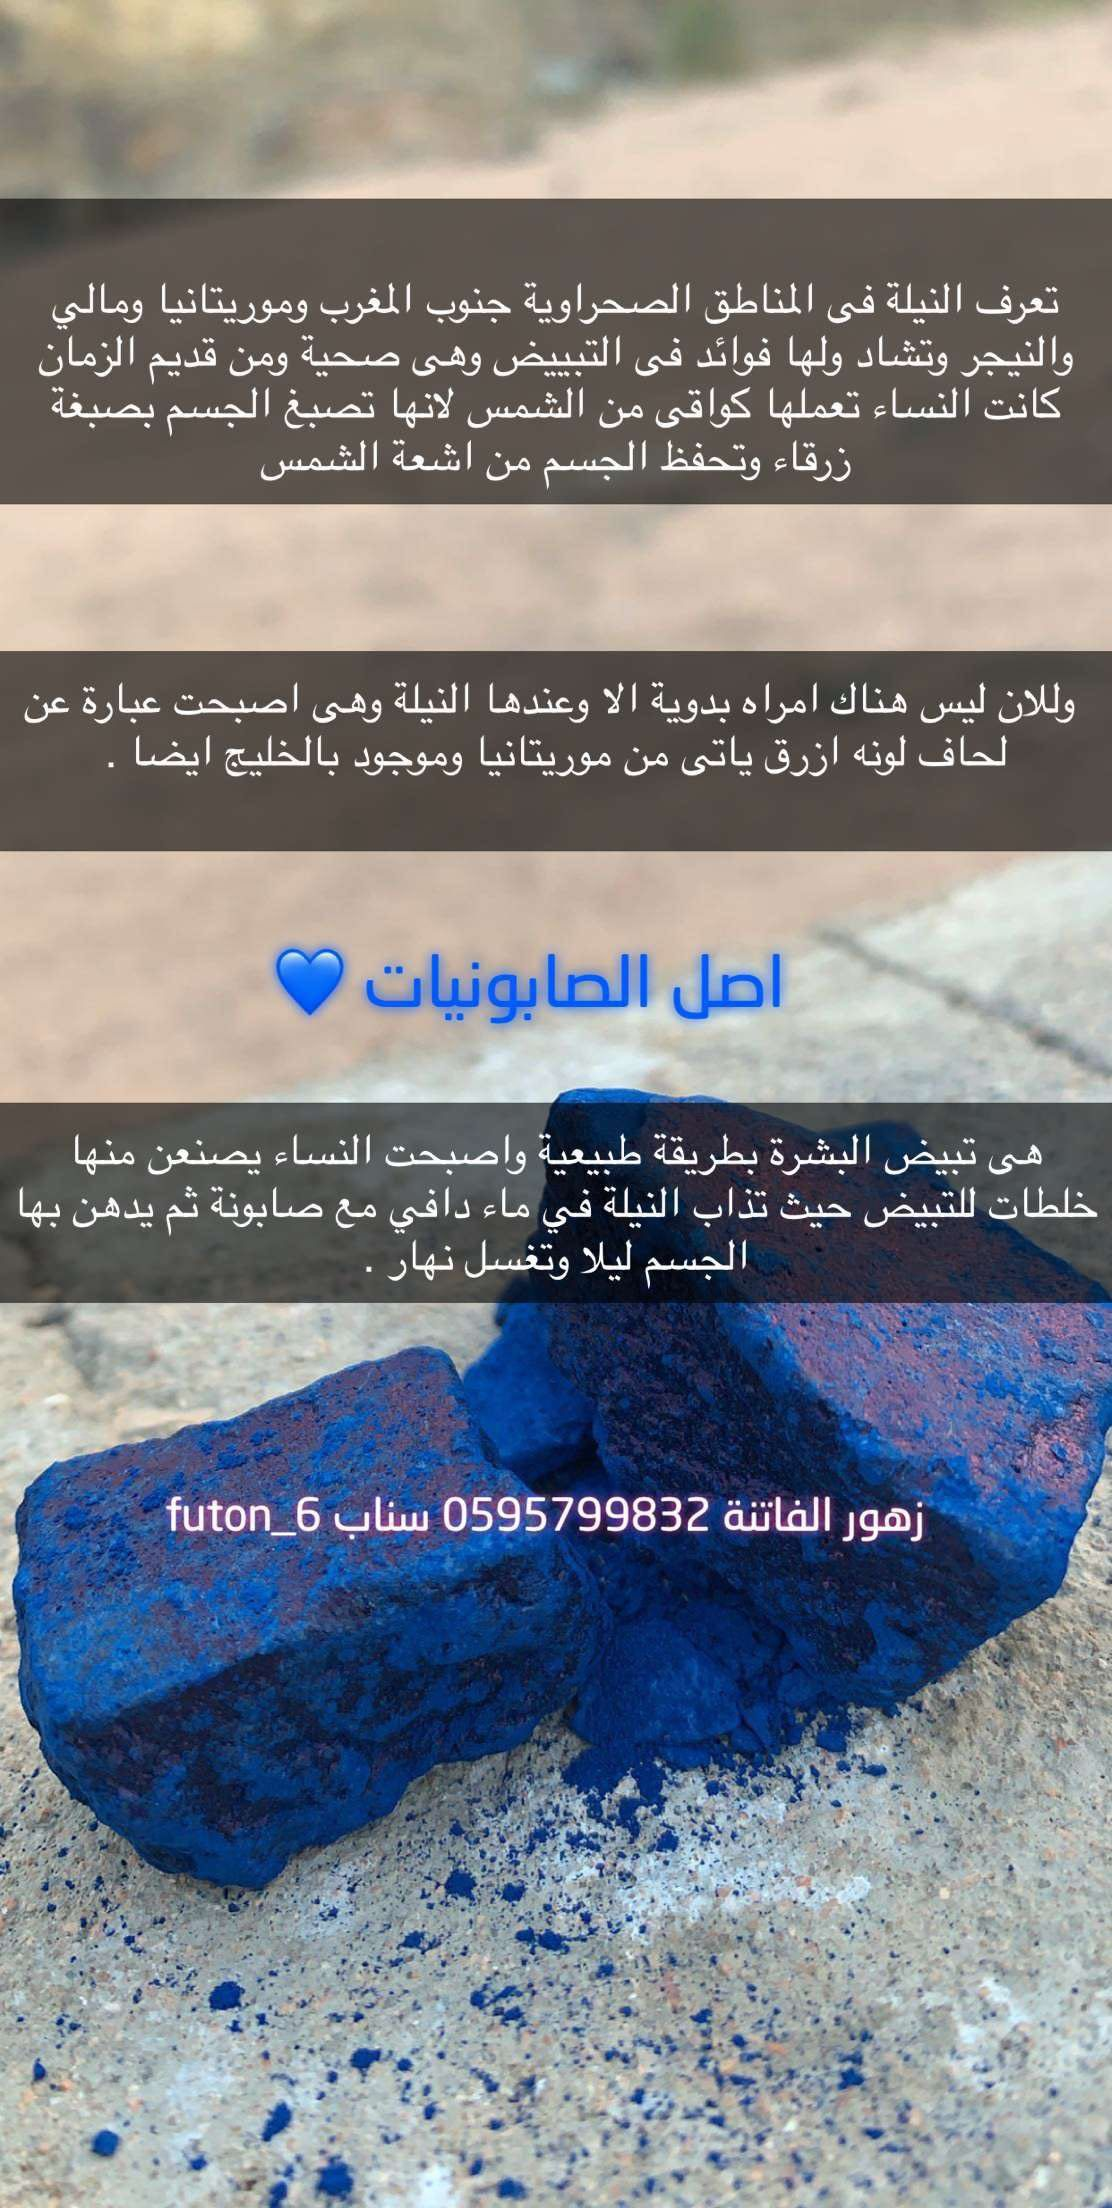 Pin By Faten Al Fatna On منتجات مغربية Lockscreen Screenshot Lockscreen Screenshots